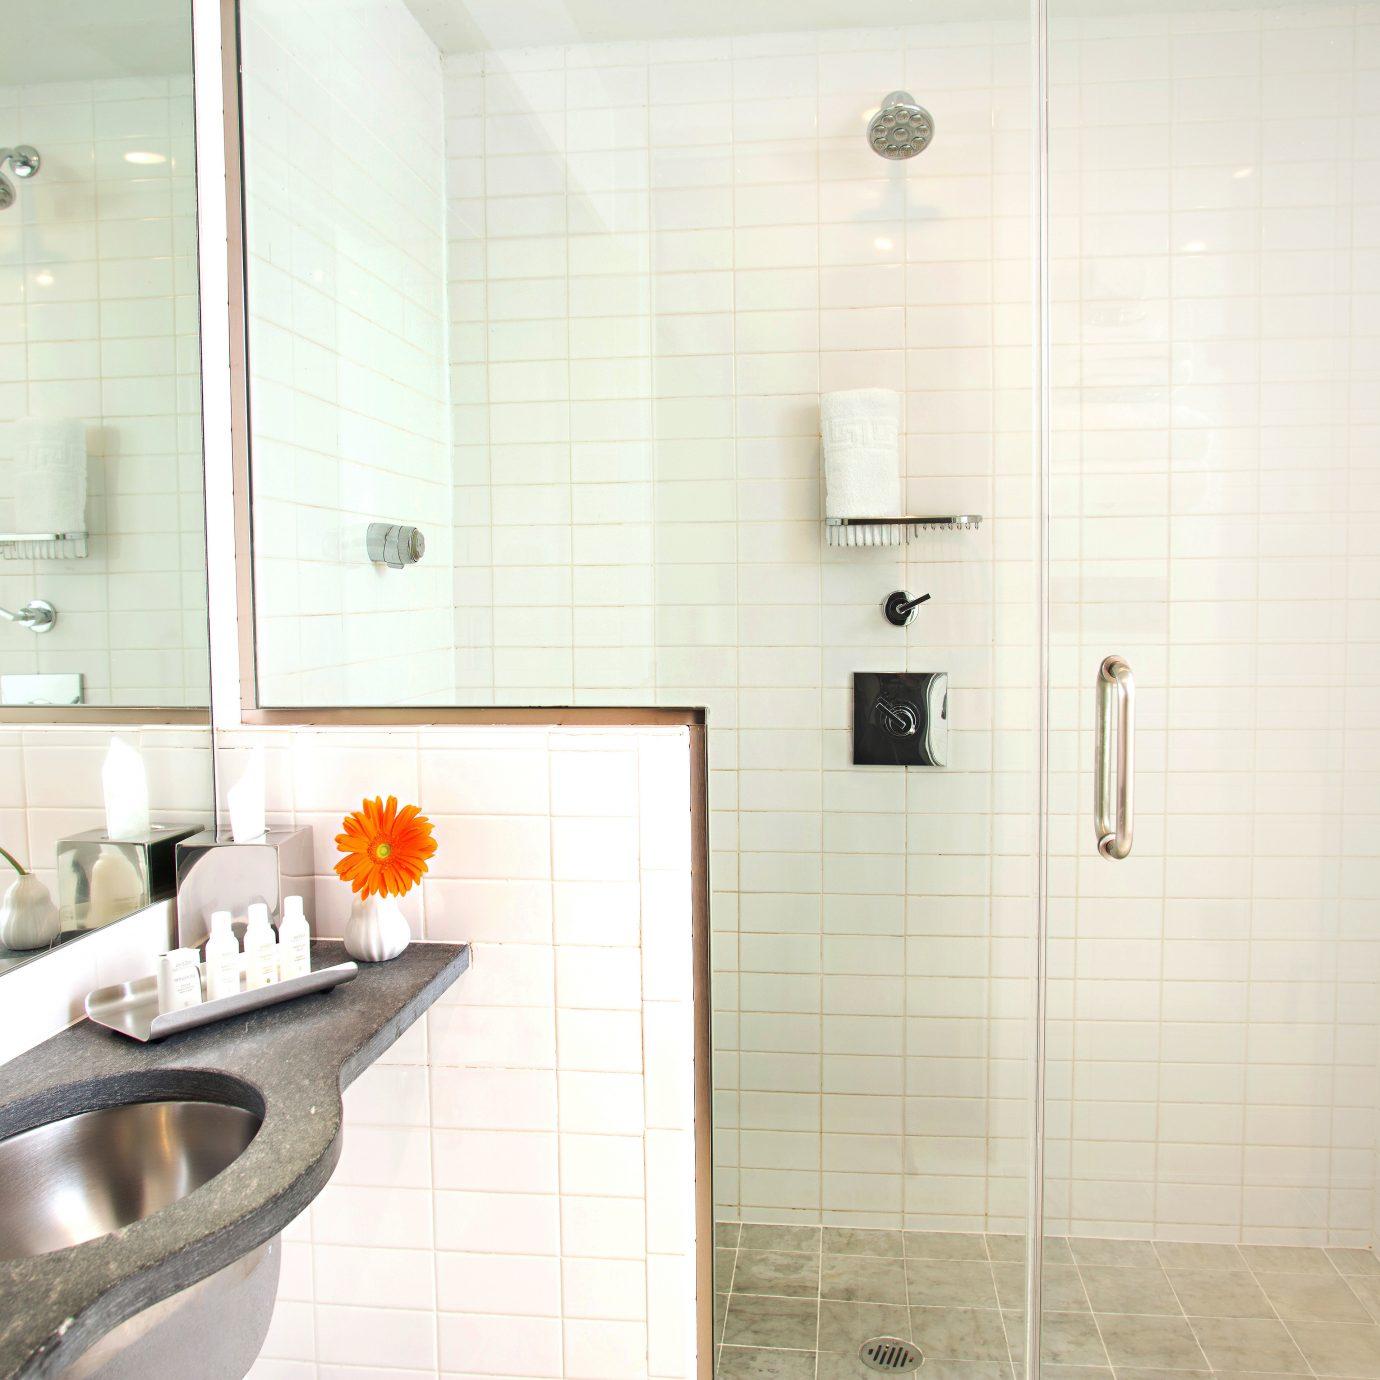 bathroom property toilet sink plumbing fixture bathtub bidet flooring